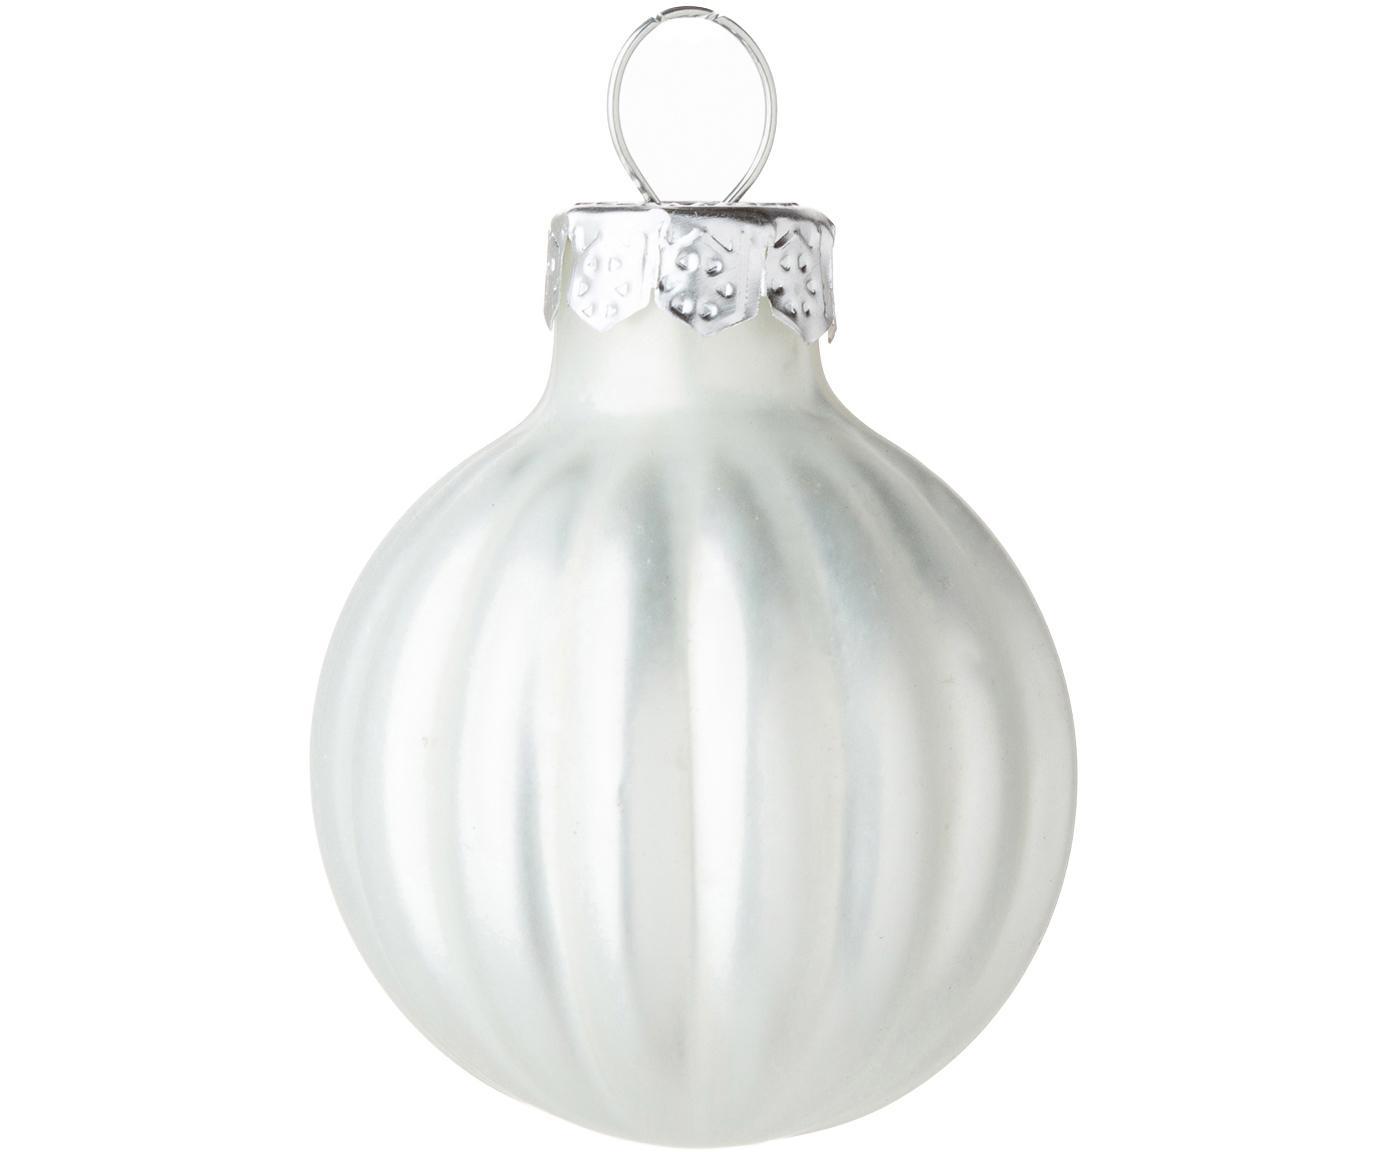 Kerstballen Rib, 12 stuks, Glas, Winterwit, Ø 3 cm